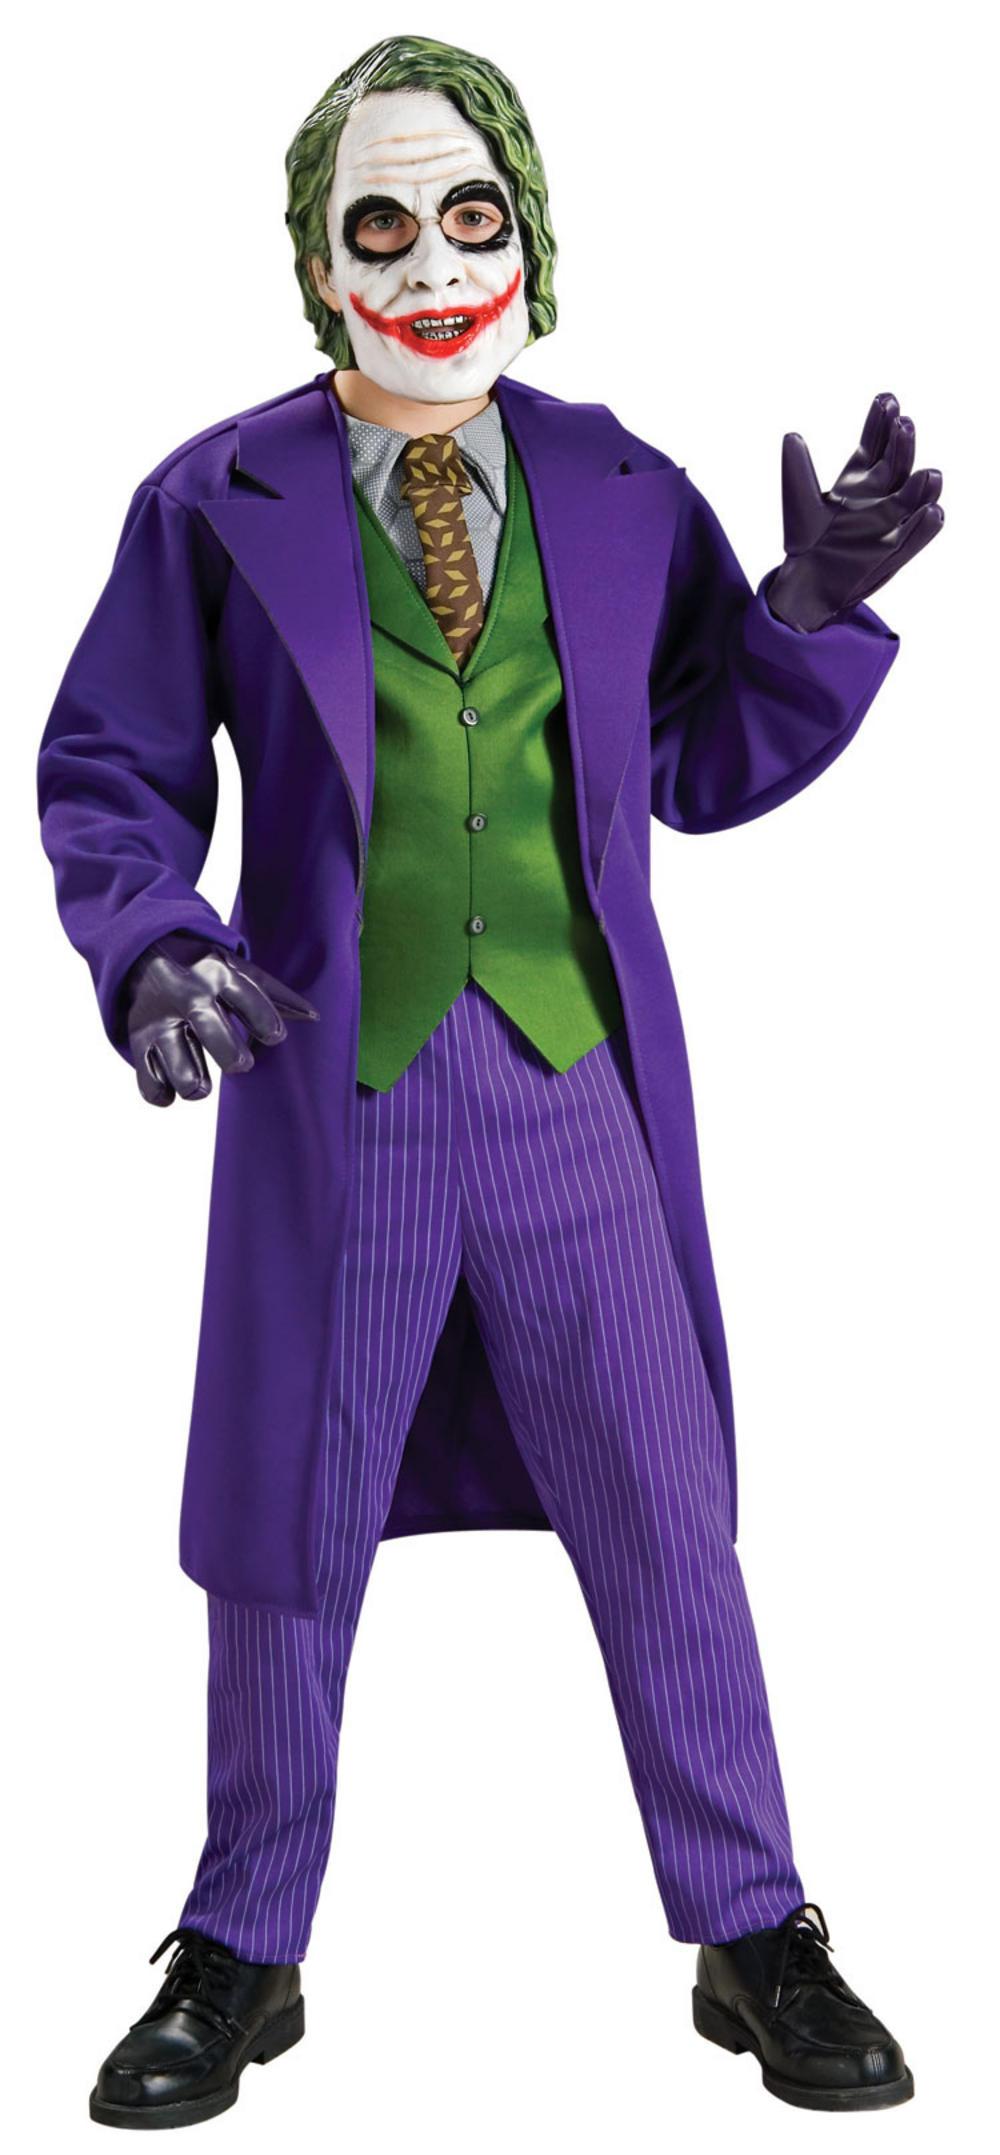 4870932e27f7 Boy's Batman Deluxe Joker Costume | TV, Book and Film Costumes | Mega Fancy  Dress